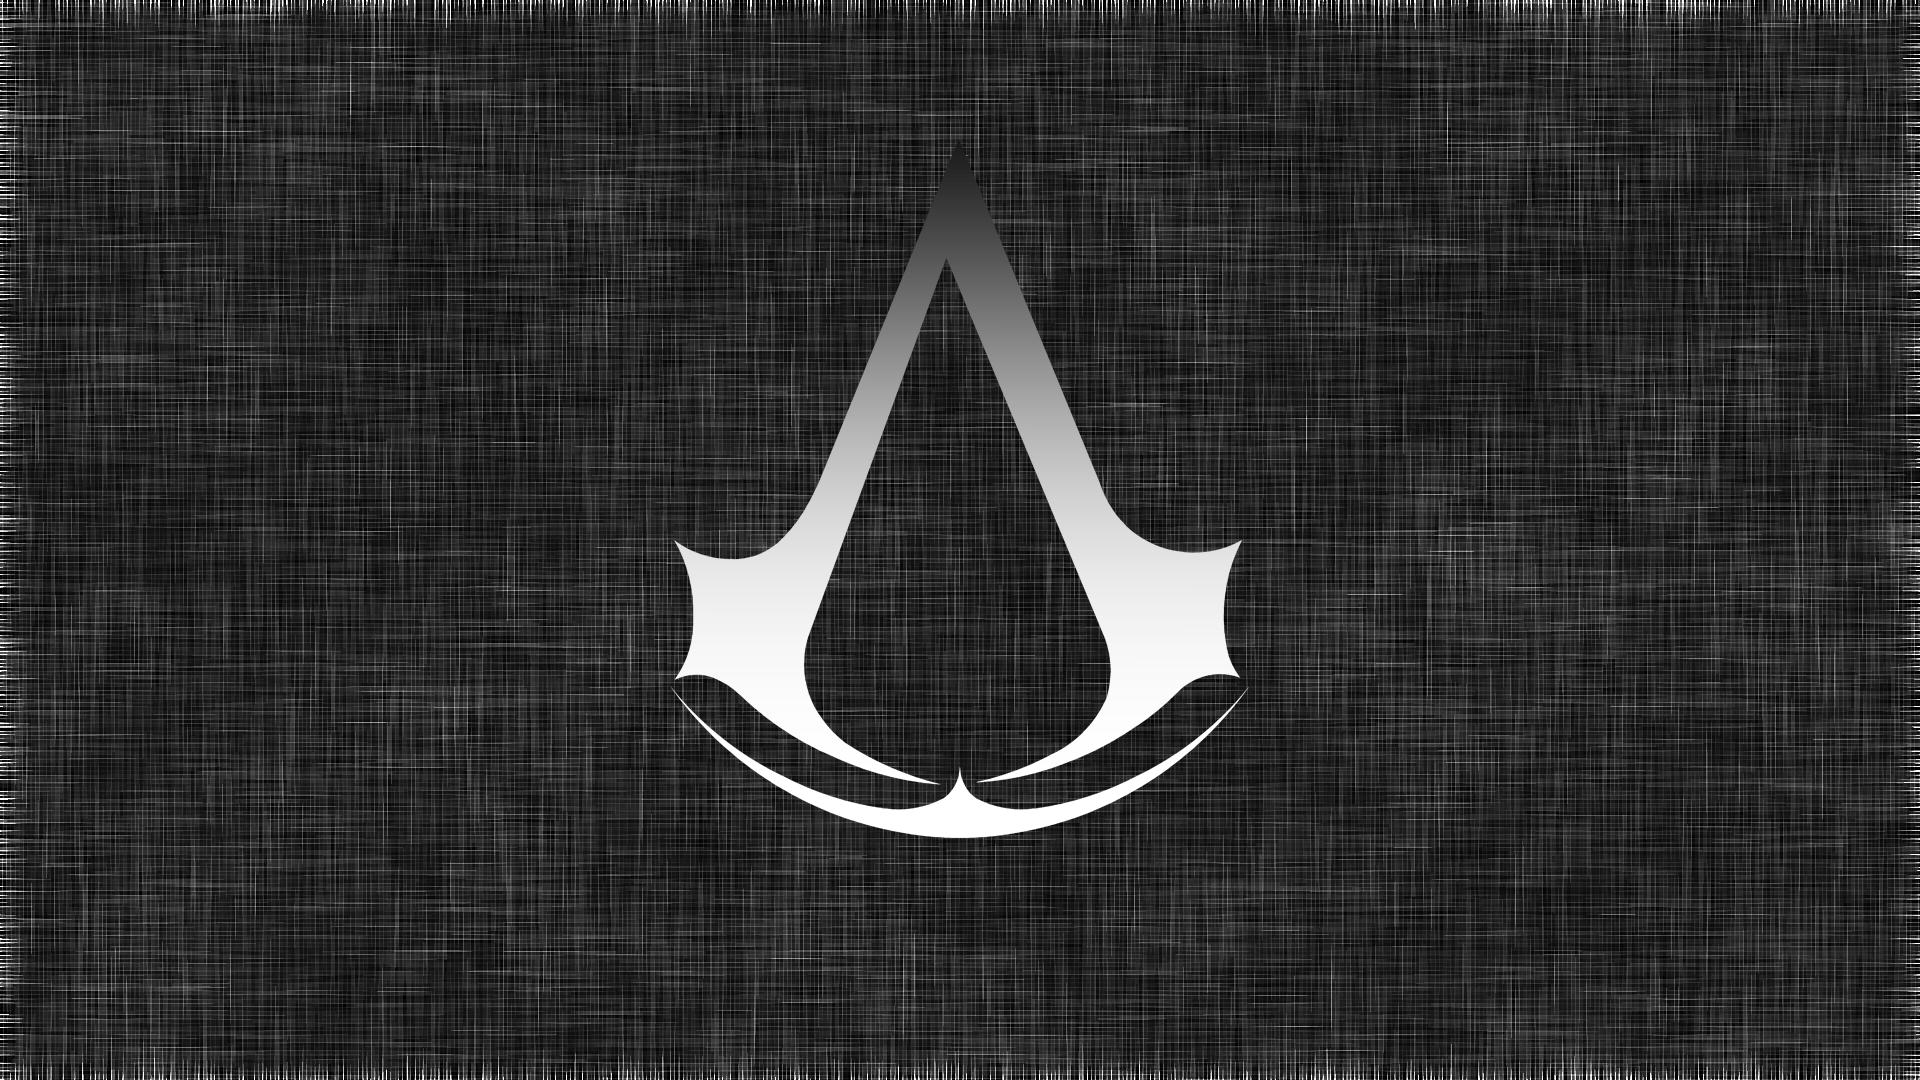 assassin  s creed wallpaper 1080p by mrsicksnips d4lfgx1 1920x1080